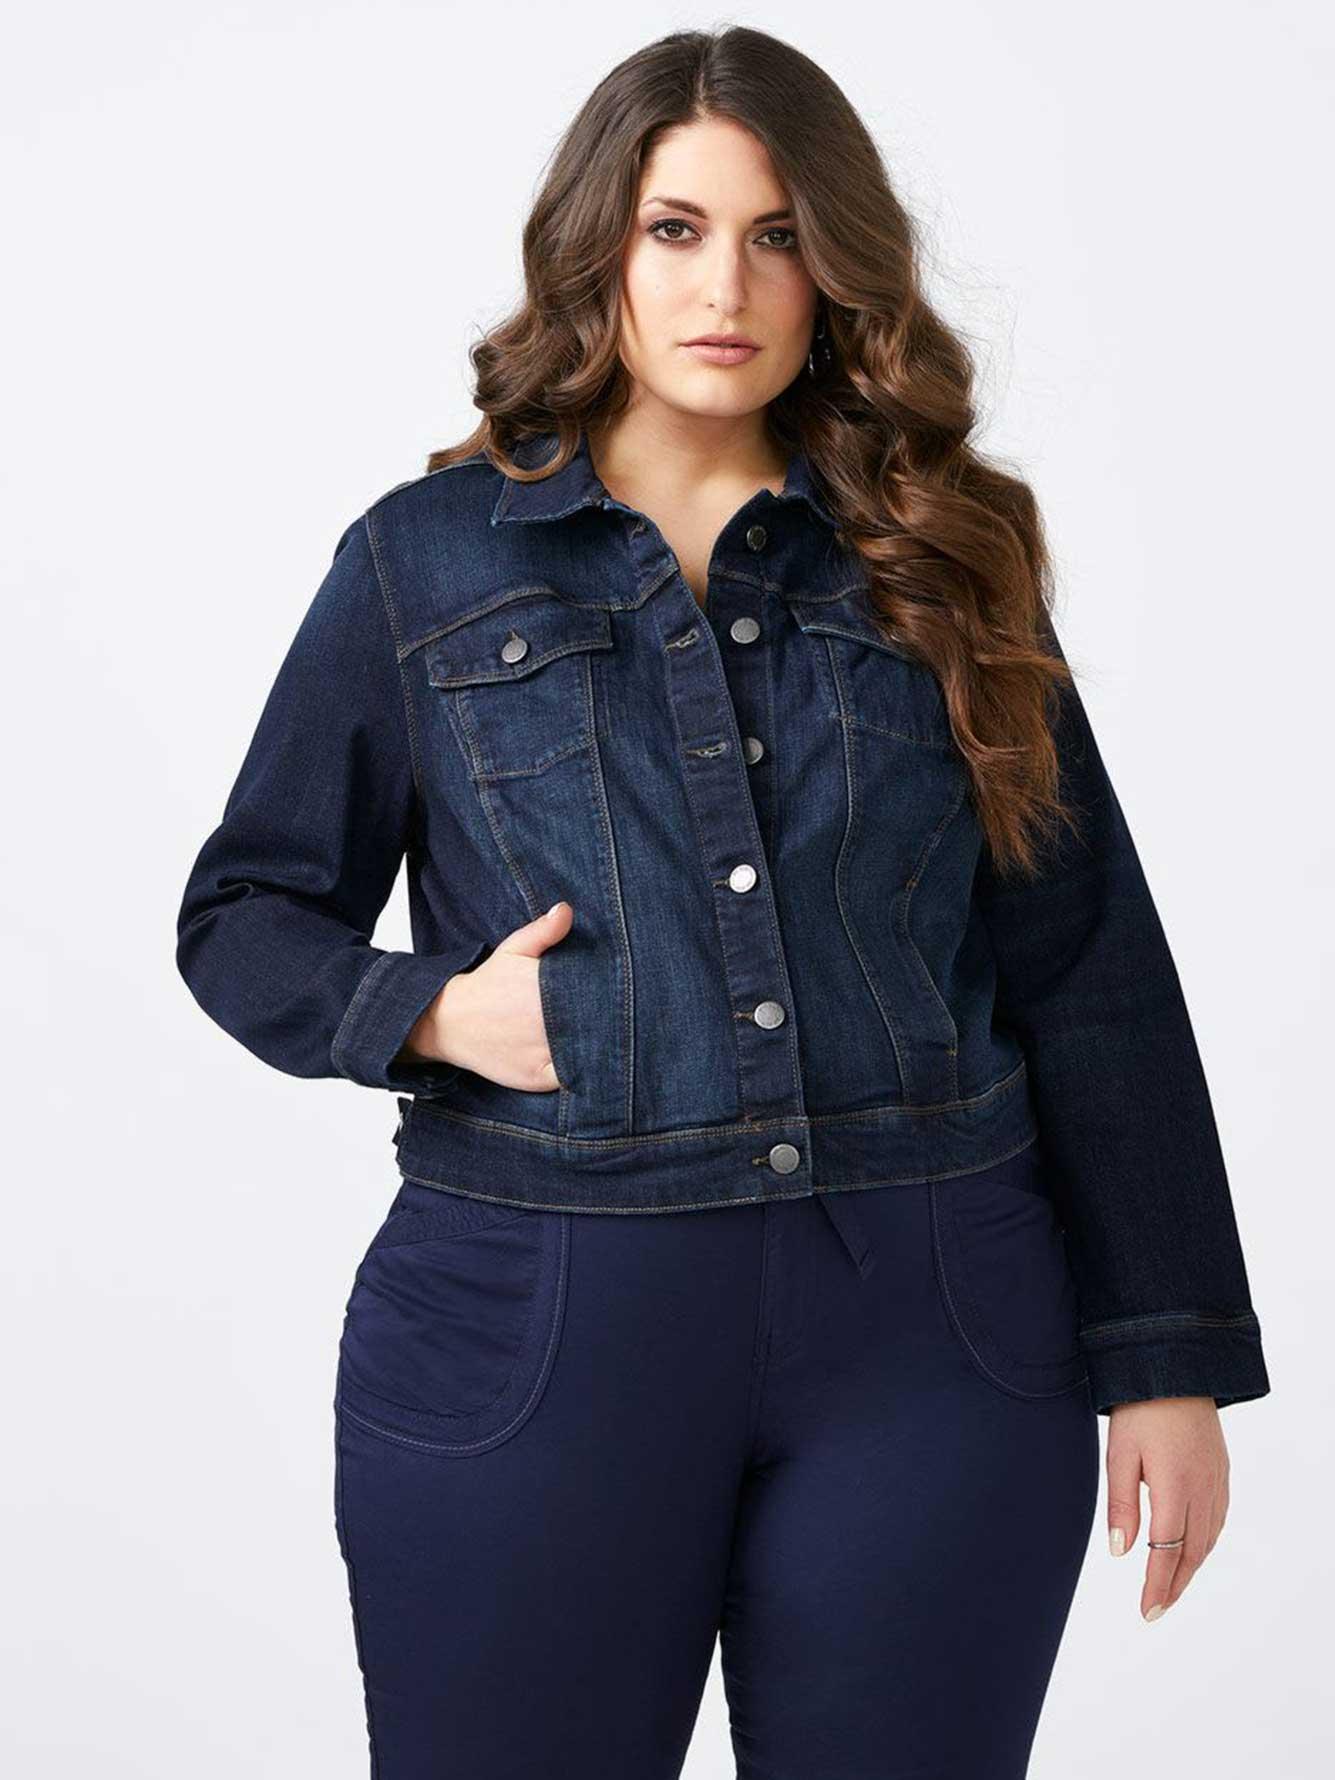 Long Sleeve Denim Jacket D C Jeans Penningtons